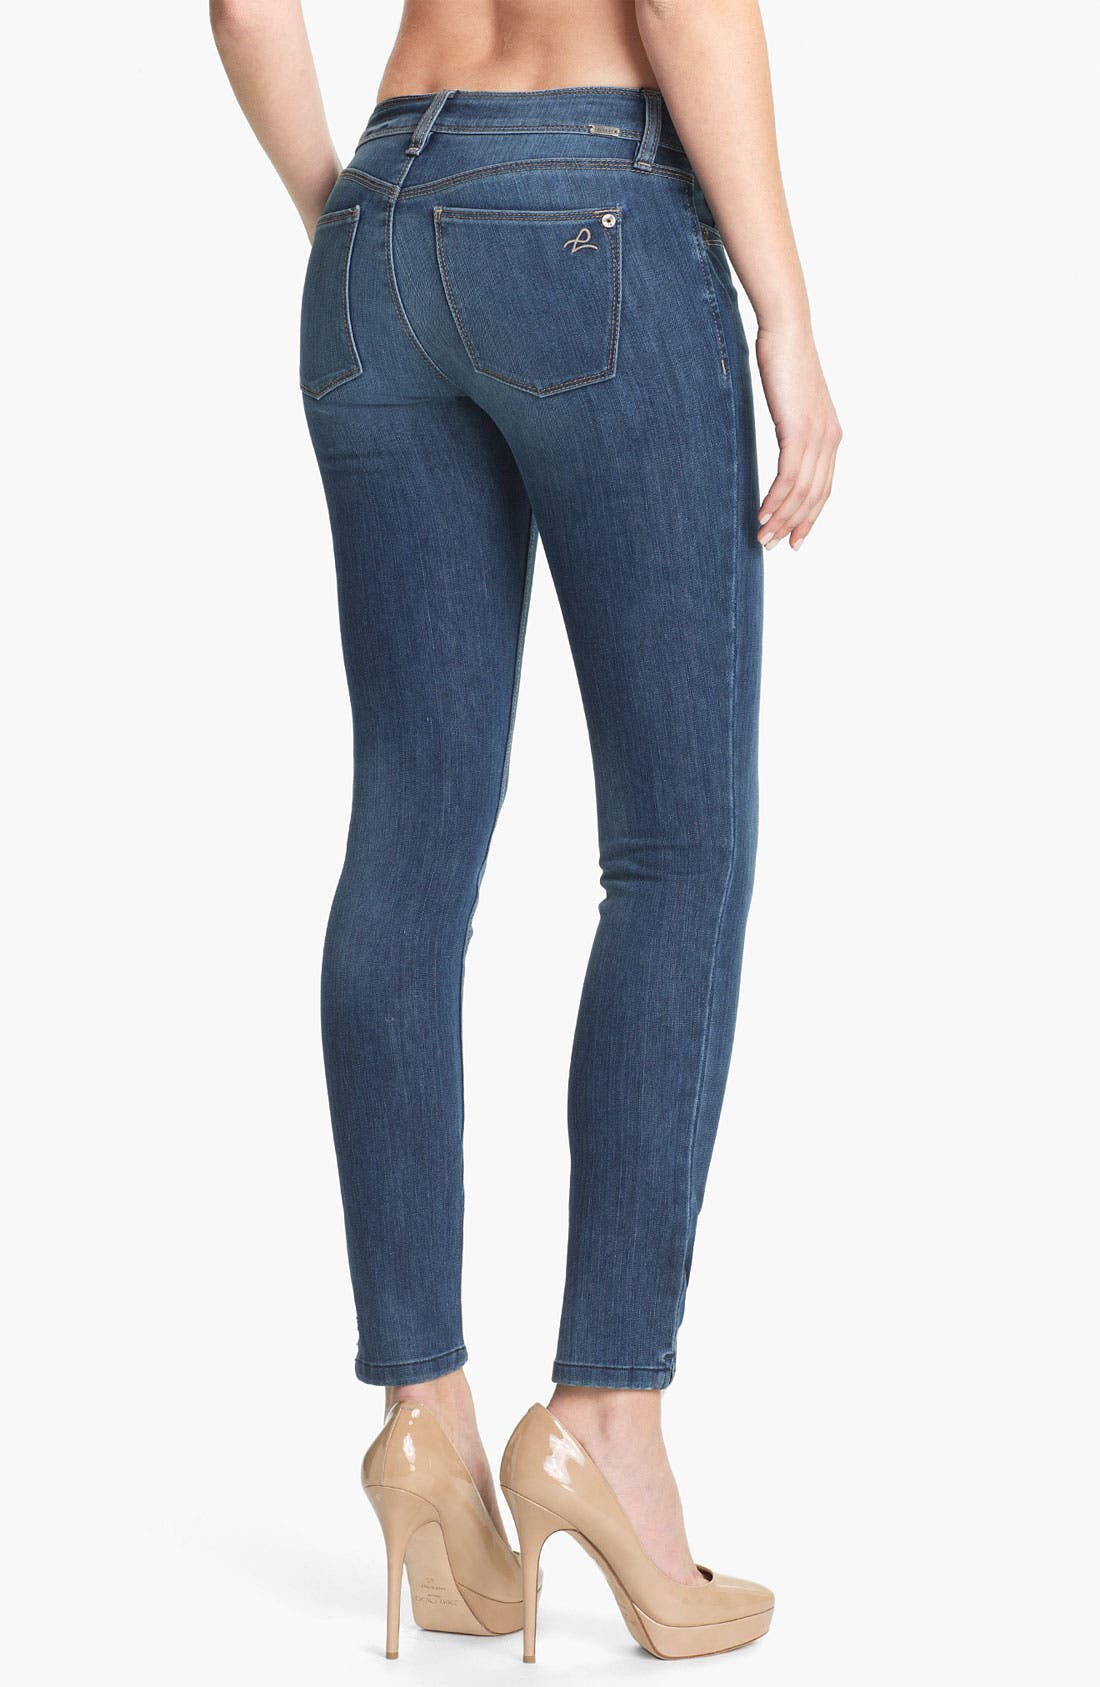 'Angel' X-Fit Stretch Denim Skinny Ankle Jeans,                             Alternate thumbnail 2, color,                             Zeppelin